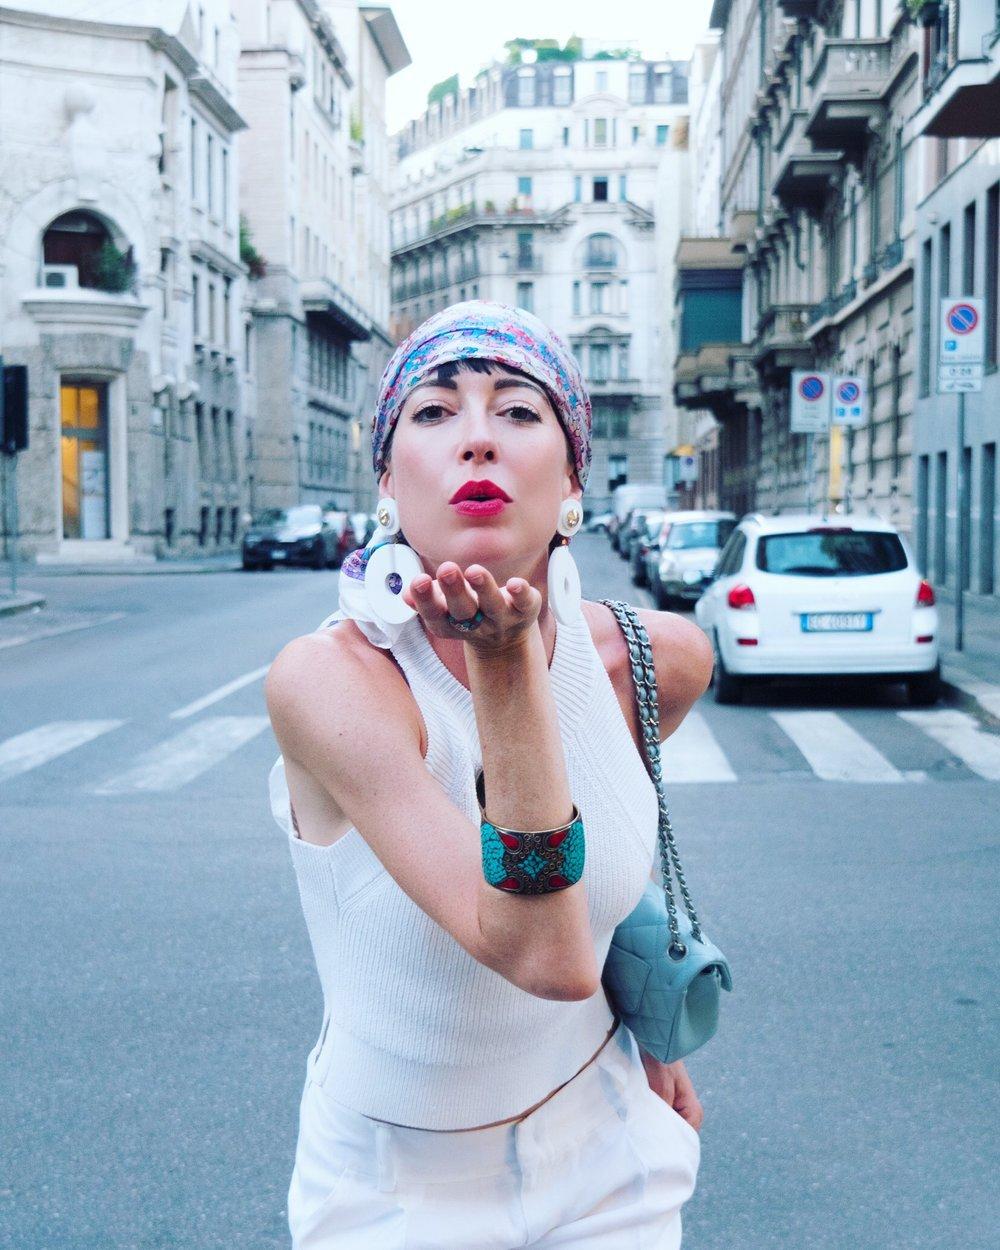 Earrings by Vitti Ferria Contin